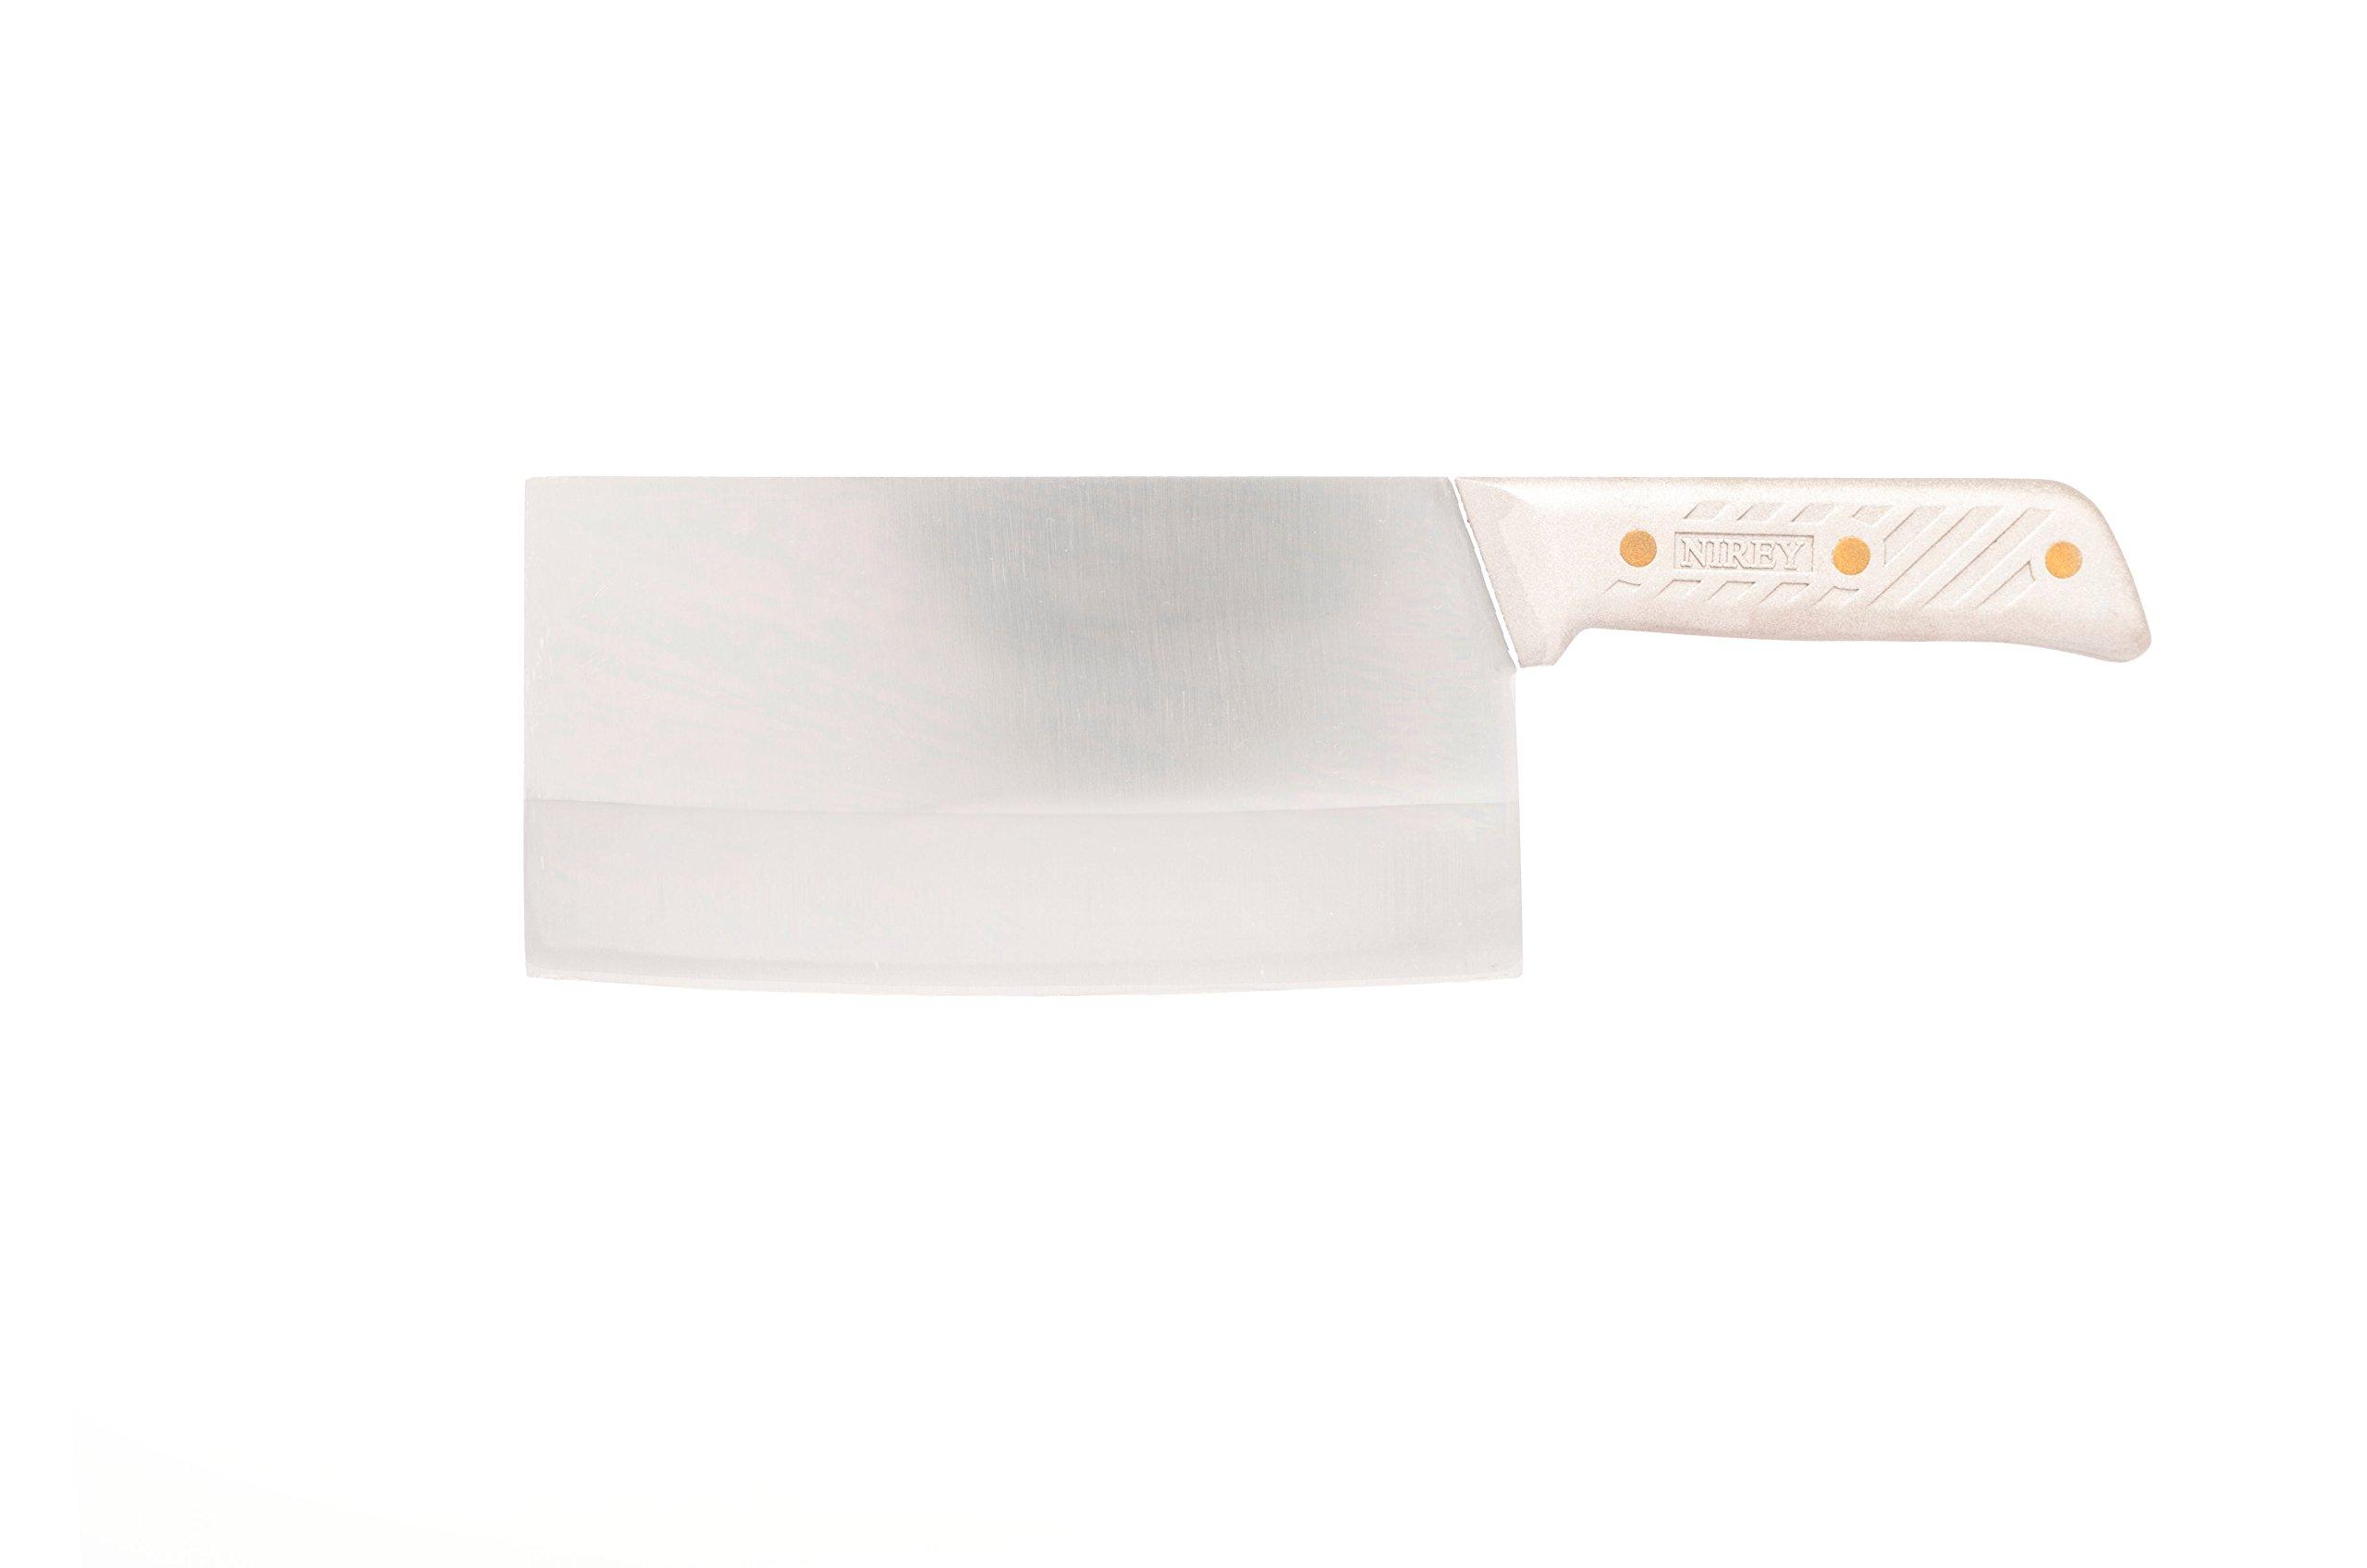 BIG CHEF KNIFE 7.3'' LAMINATED 3 LAYER HANDCRAFT STEEL HANDLE